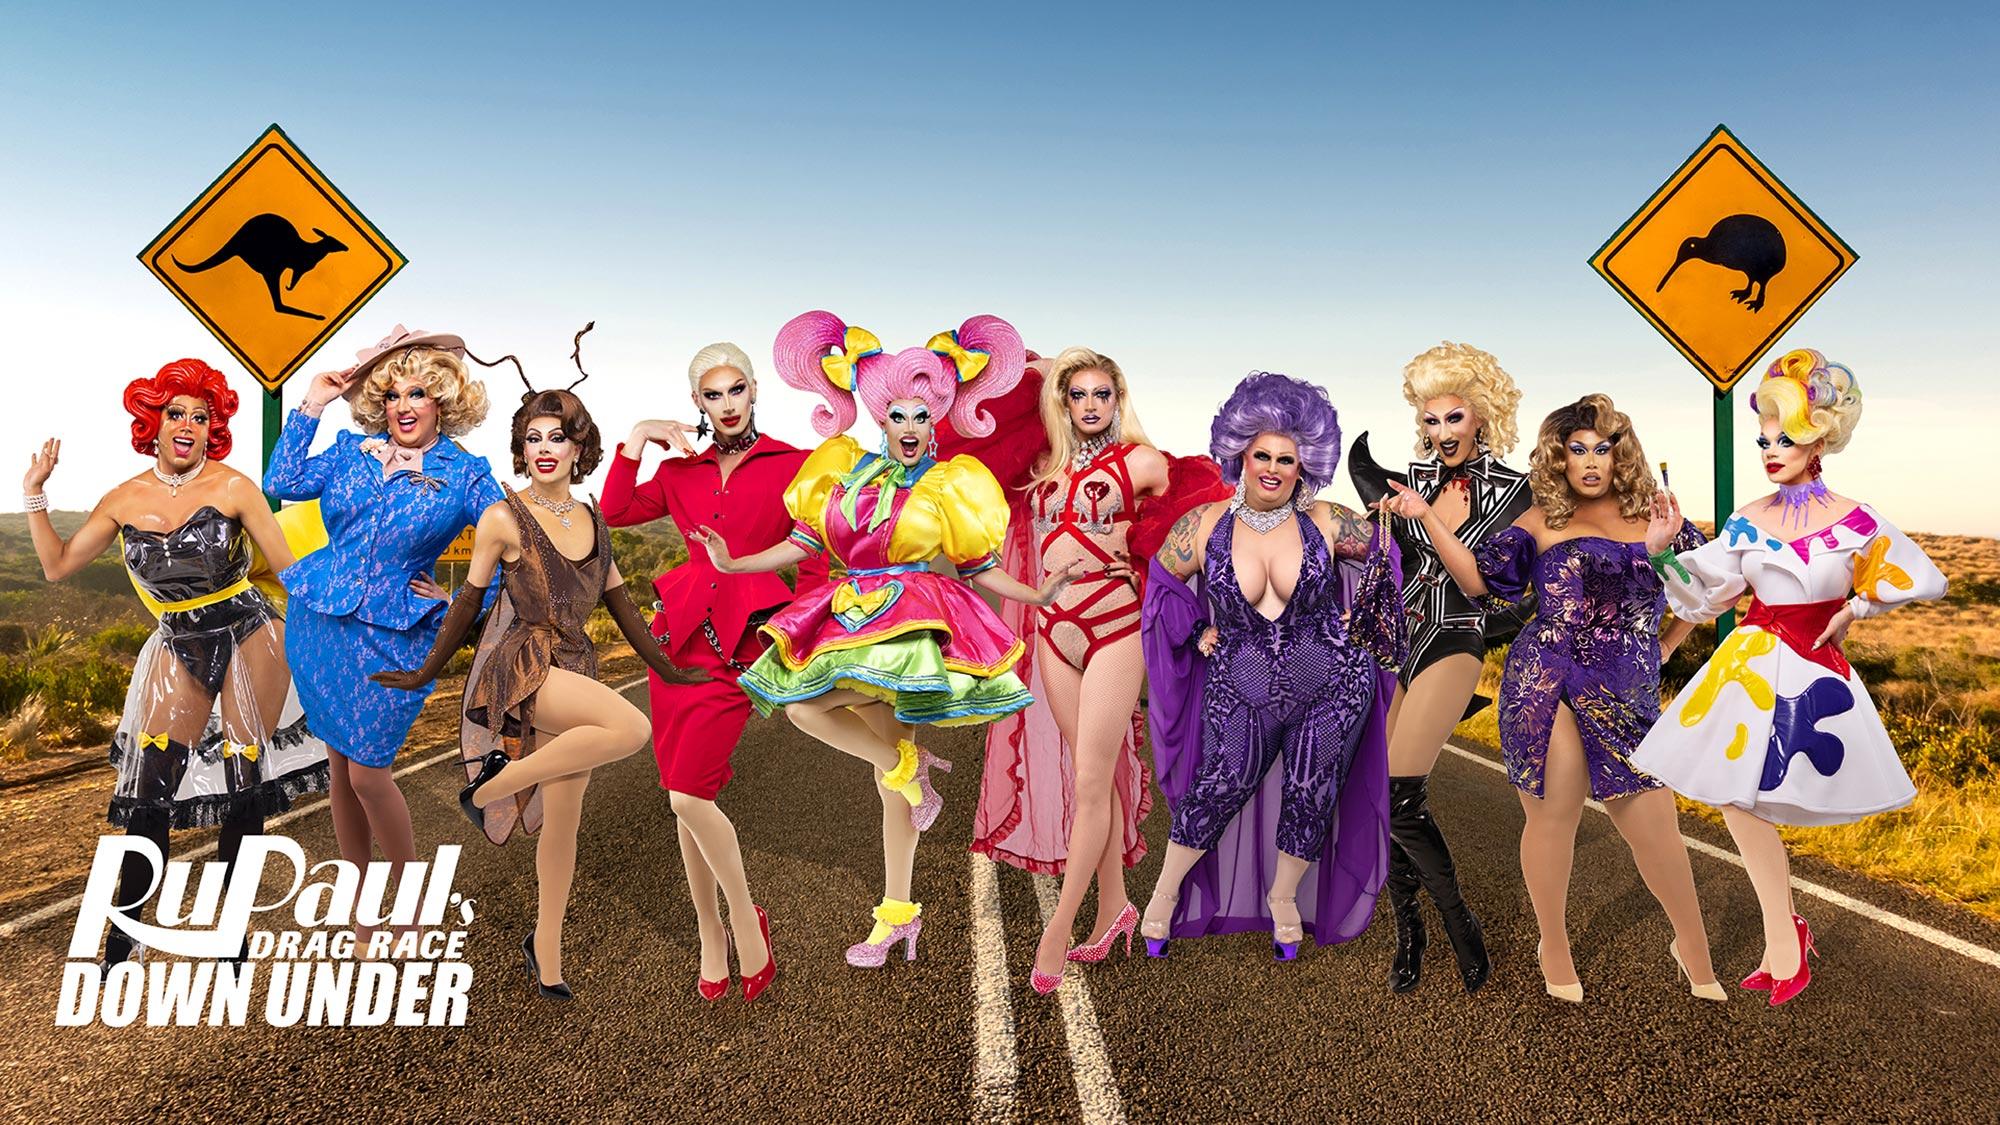 Stan announces cast of RuPauls Drag Race Downunder at Mardi Gras.